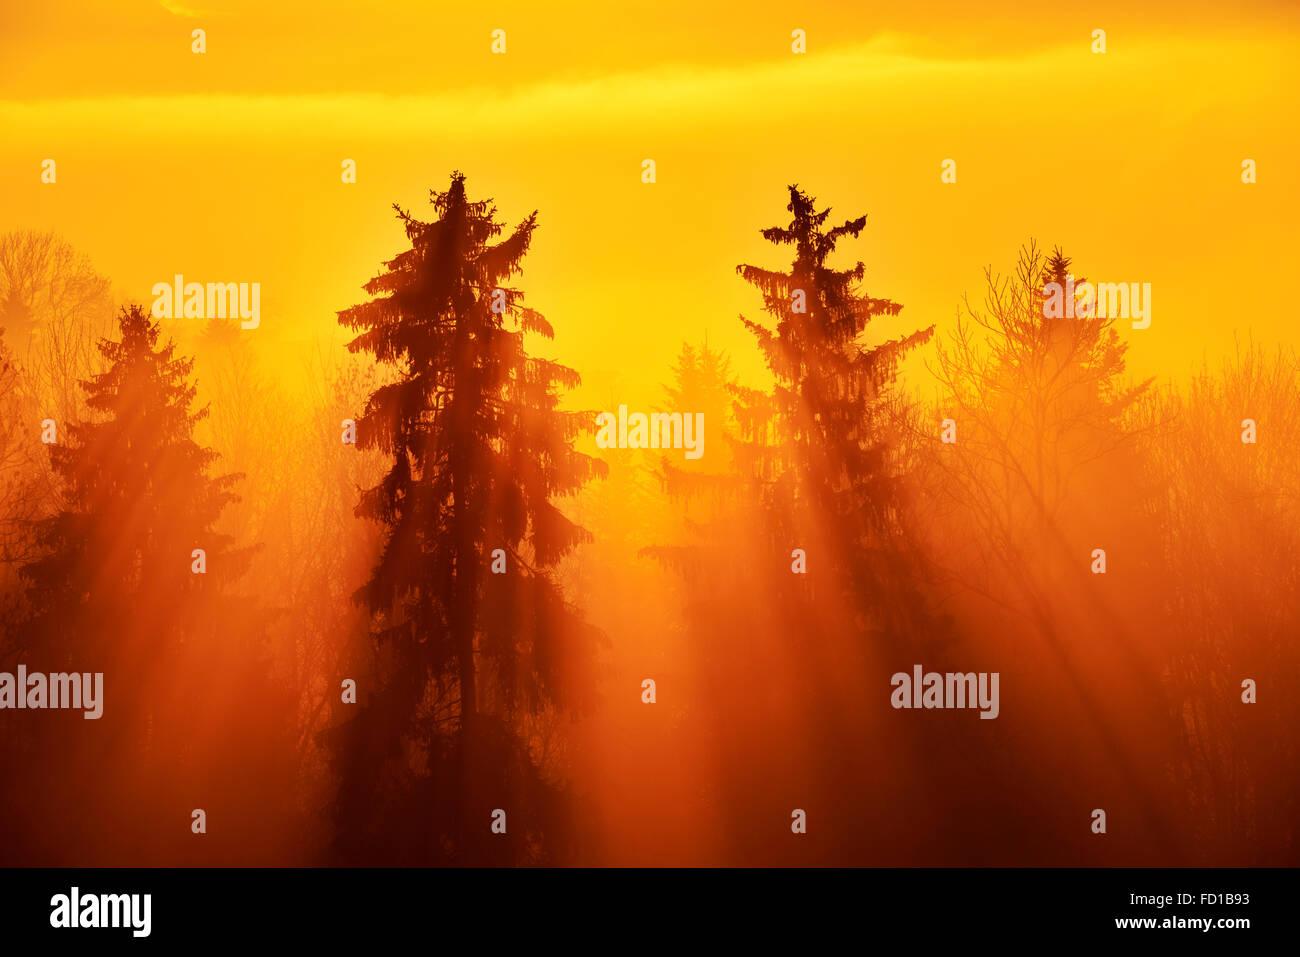 Sun rays shining through foggy spruce forest, Canton of Zug, Switzerland - Stock Image